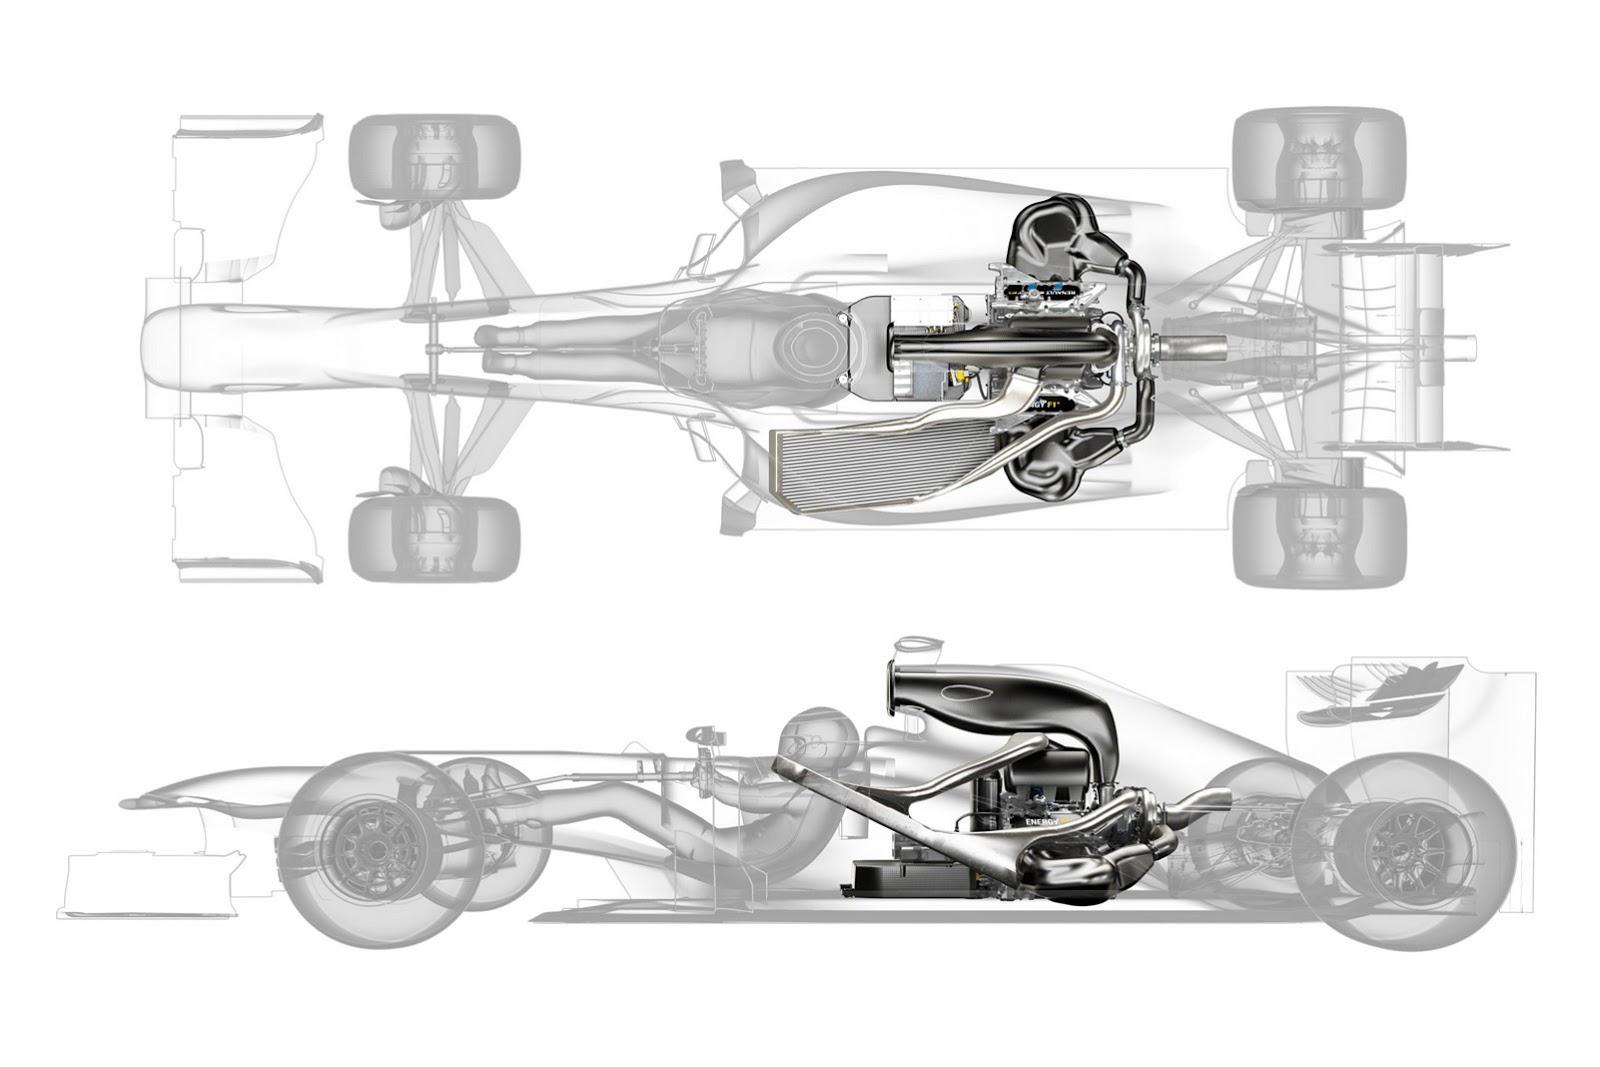 Uloženie V6 turbo motora v monoposte F1